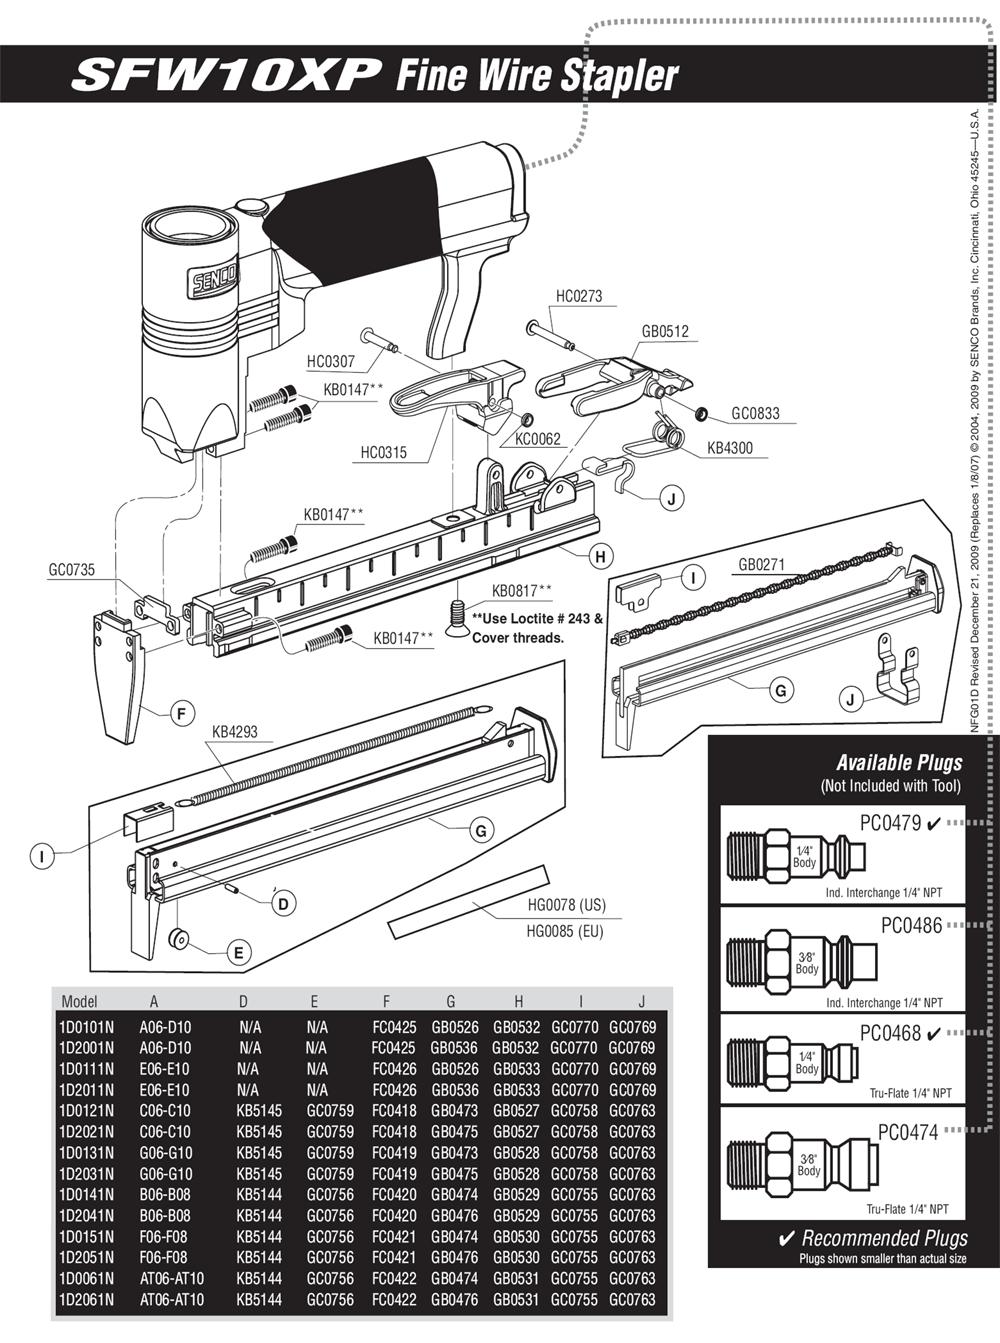 1D0131N-senco-PB-1Break Down